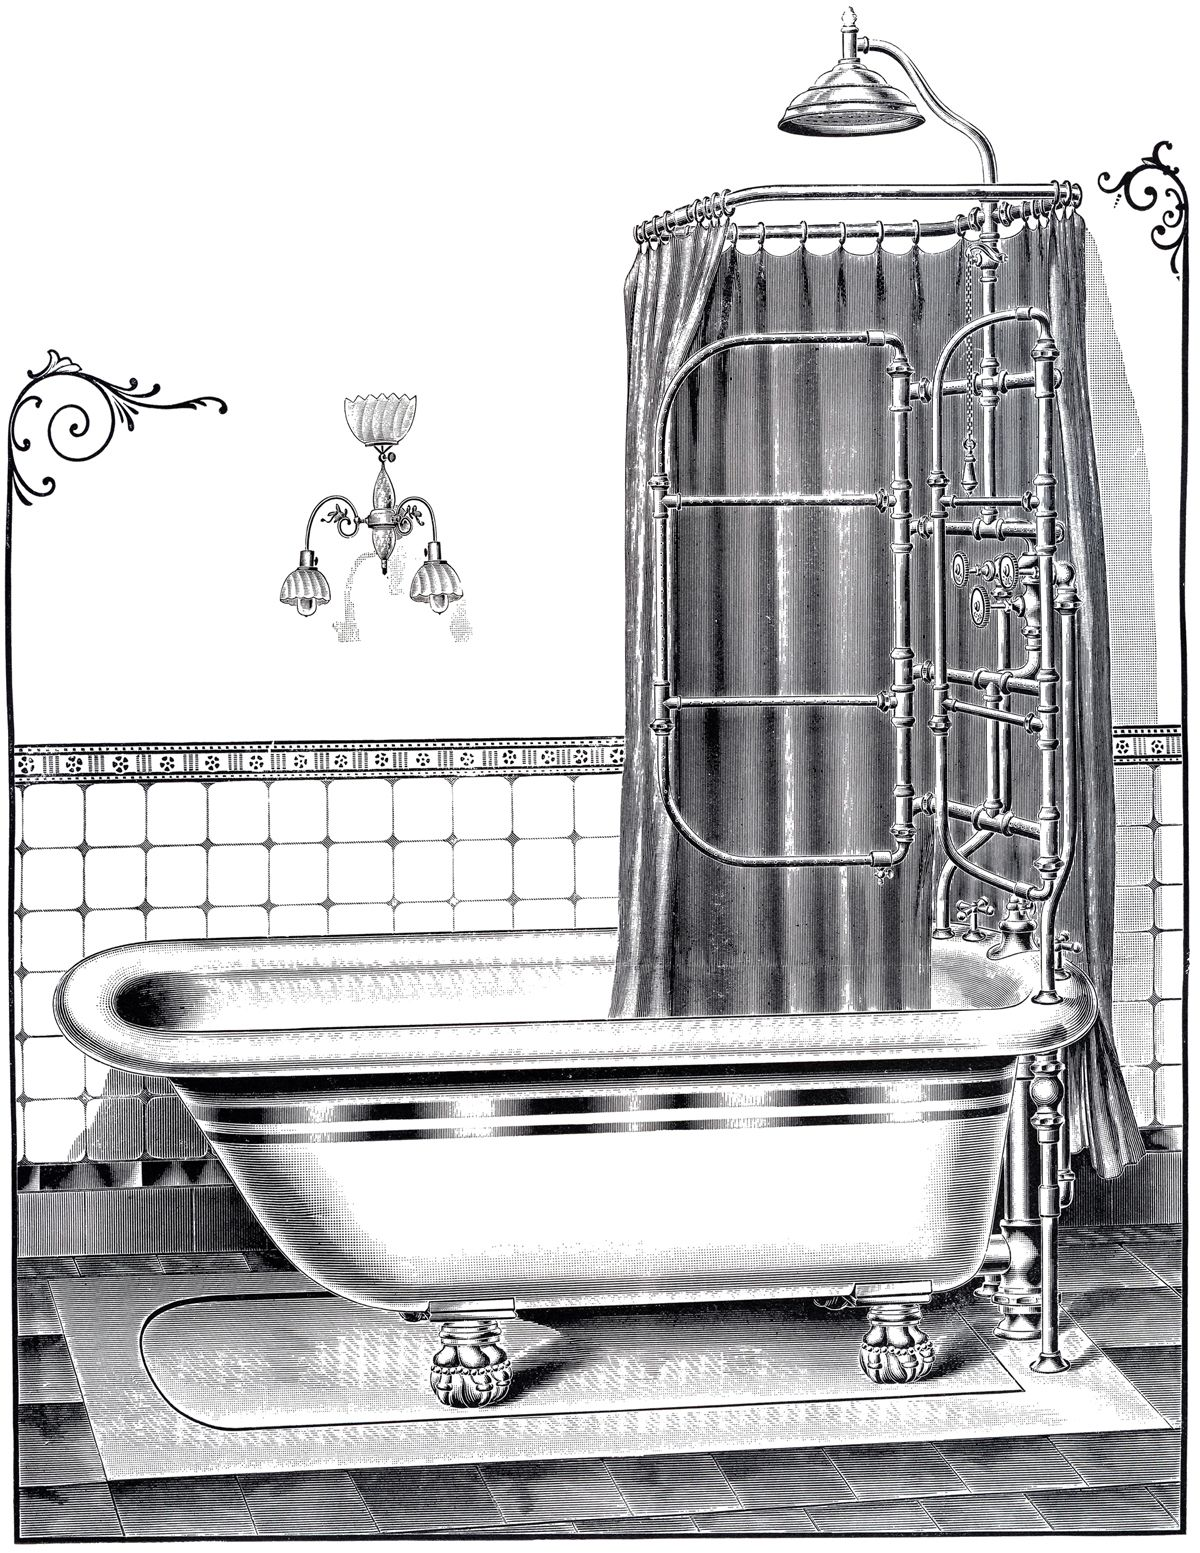 Victorian ere bathtub clipart graphic library download Vintage Bathtub Printable | Potty Break | Vintage bathtub ... graphic library download